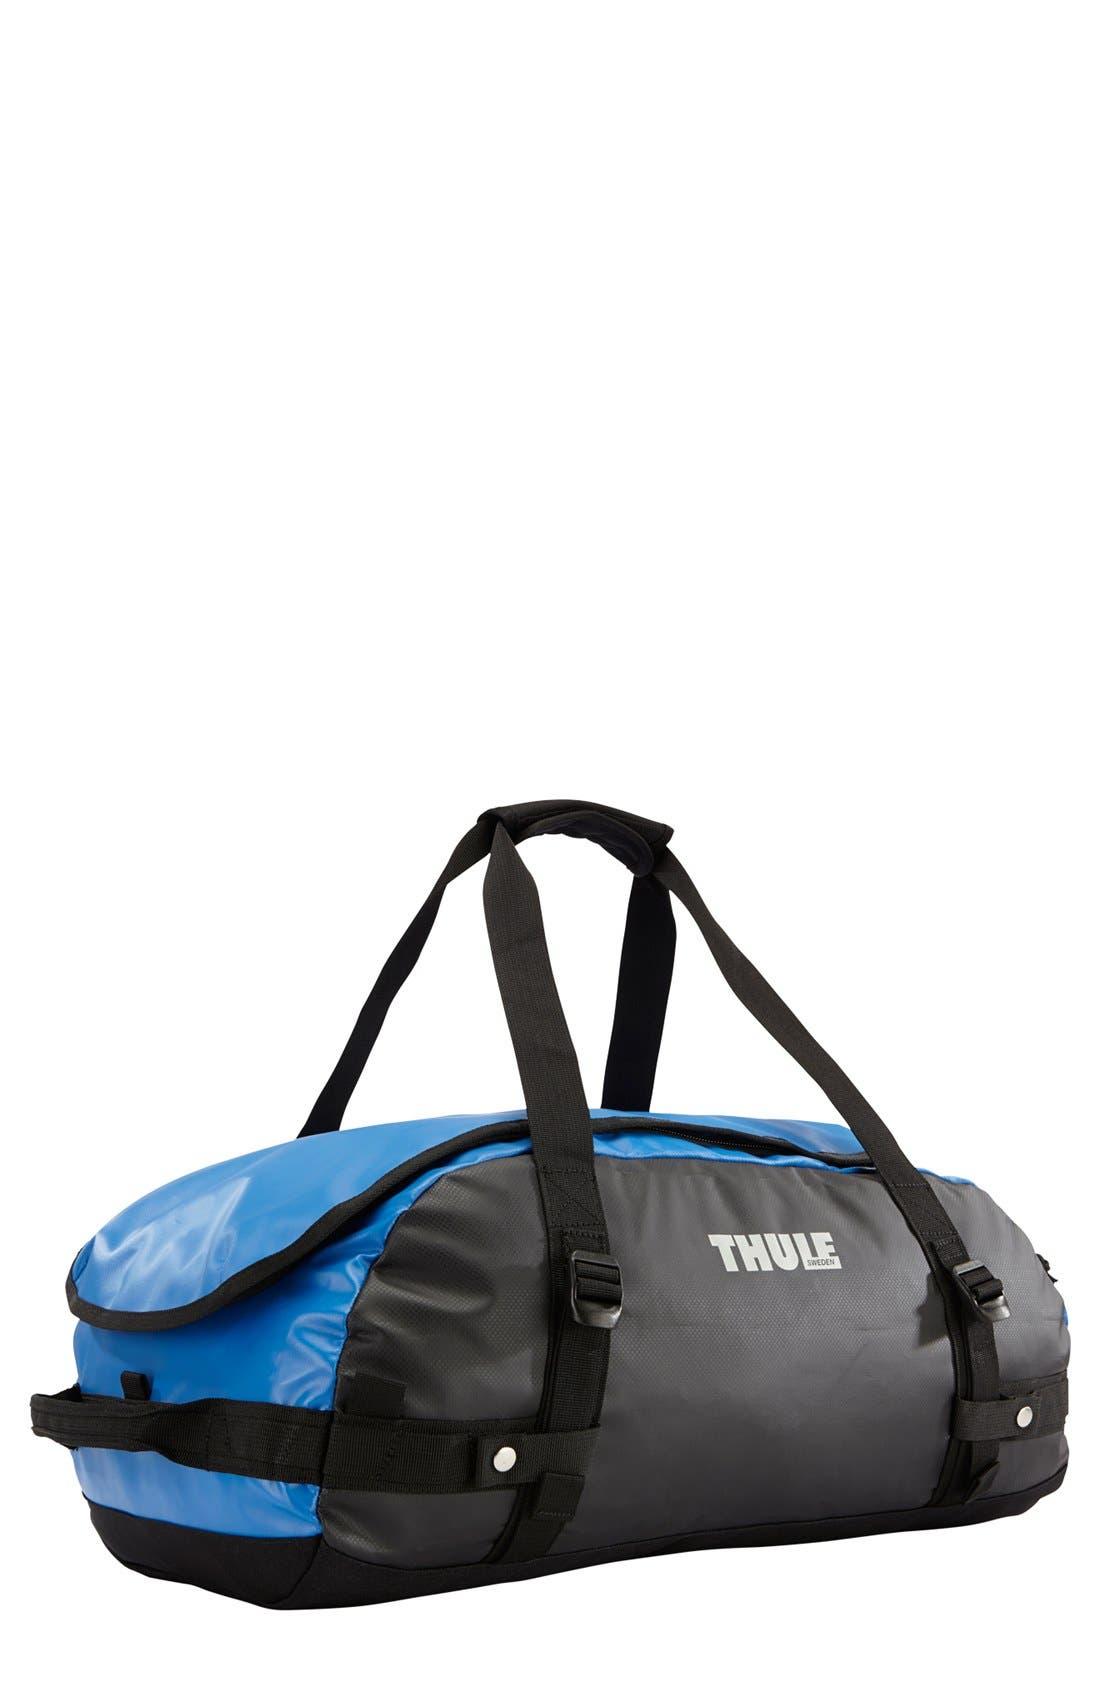 Alternate Image 1 Selected - Thule Small Duffel Bag (40L Capacity)